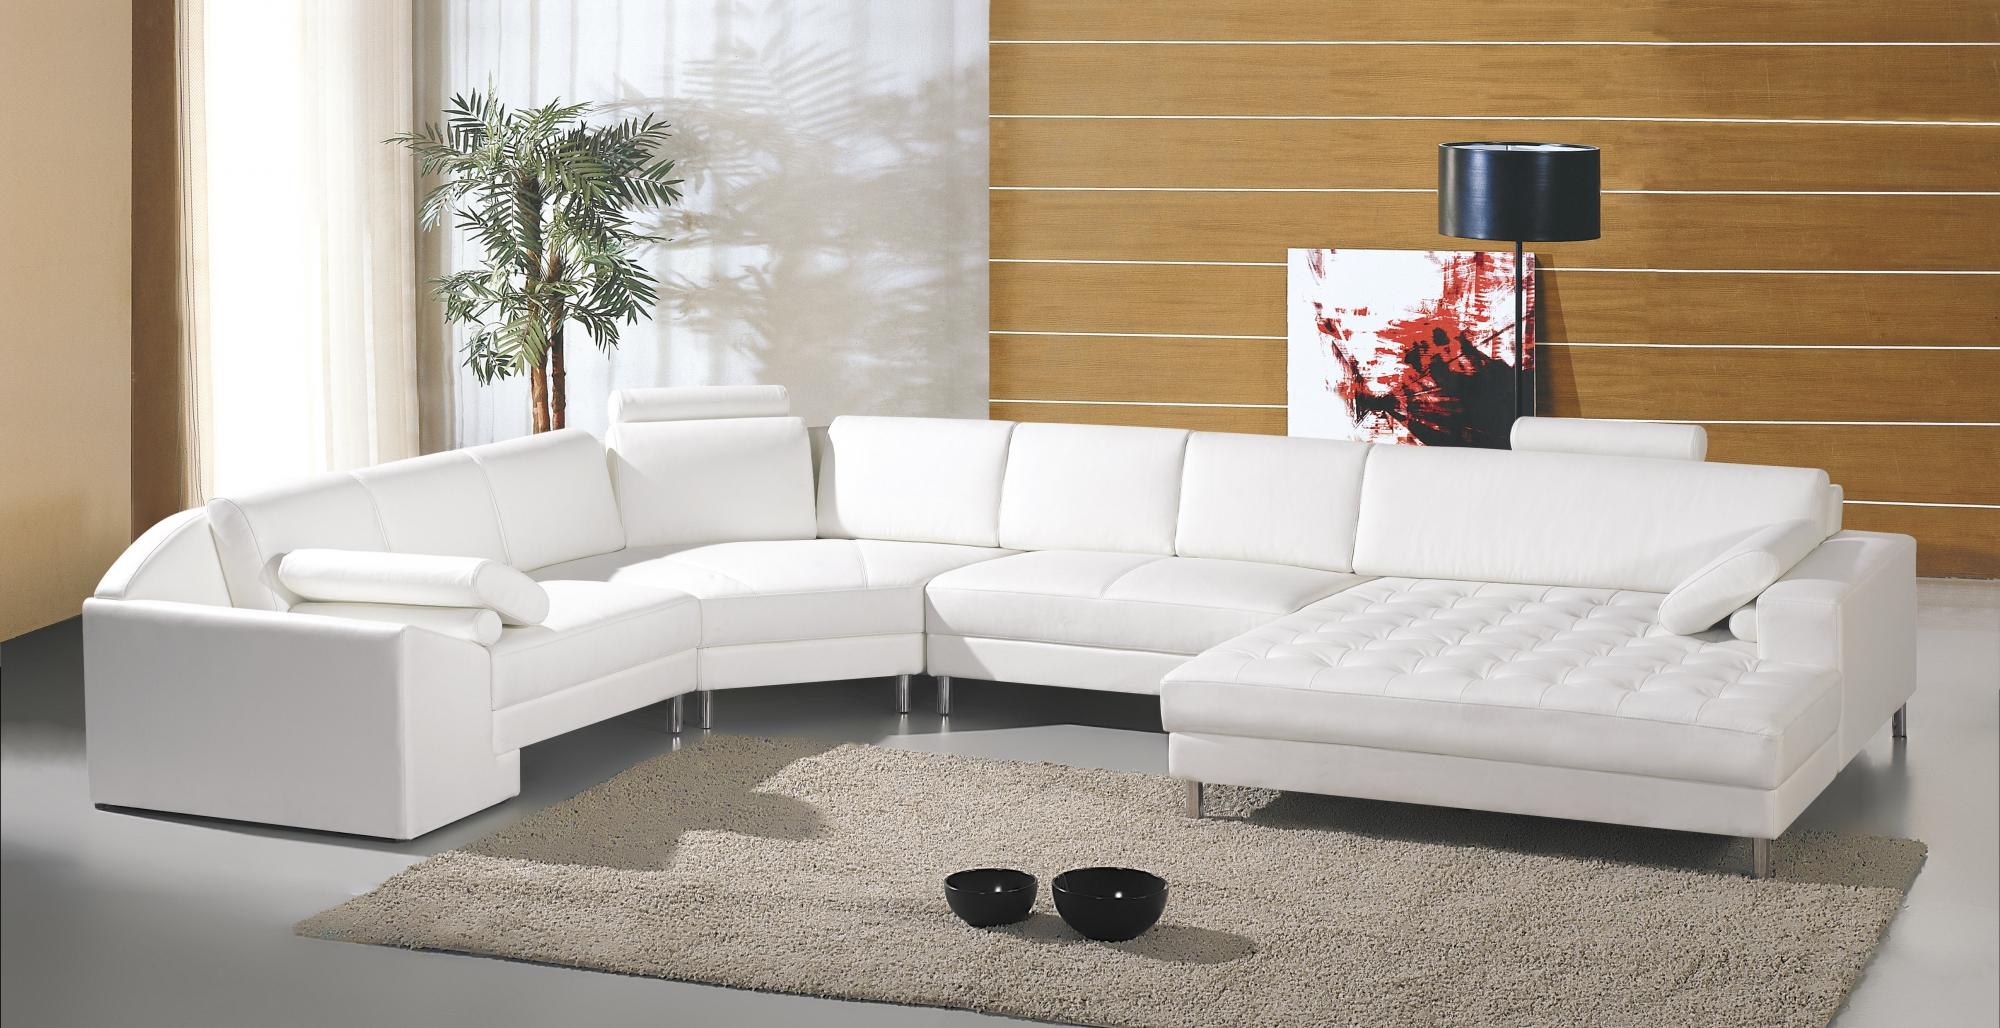 DECO IN PARIS Canape panoramique cuir blanc houston can